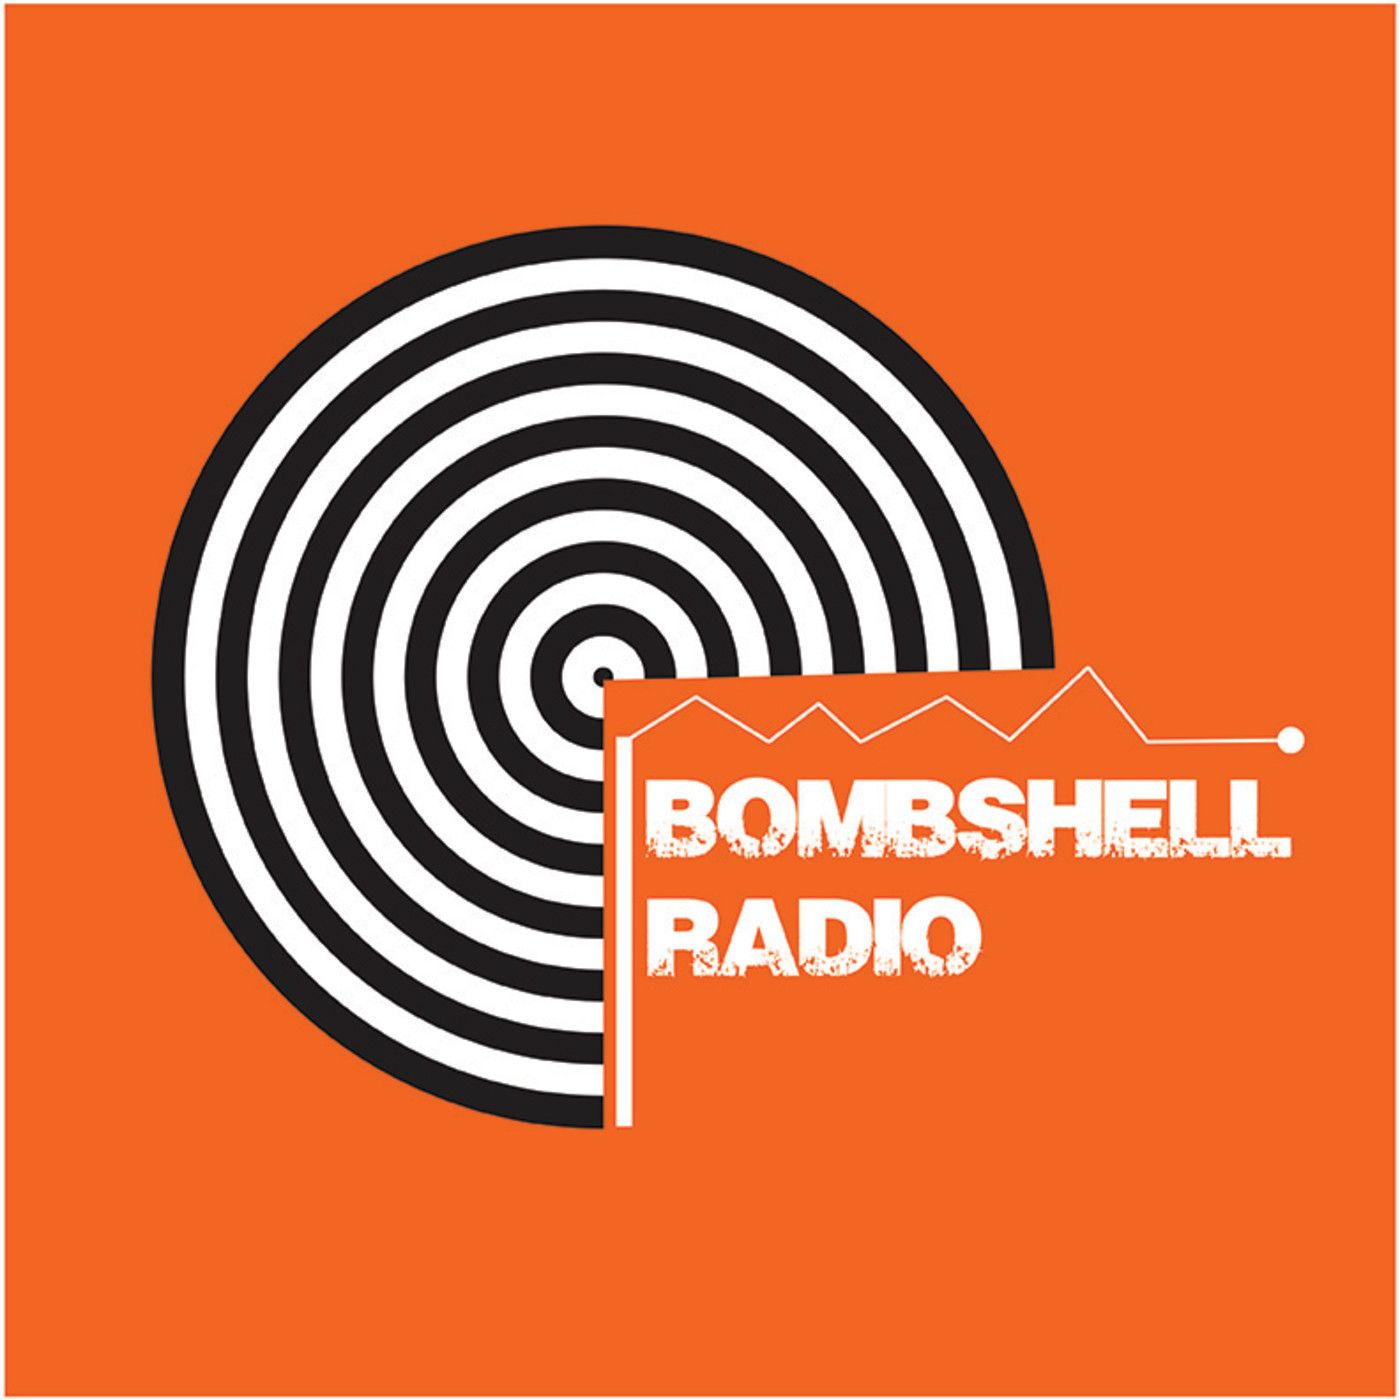 Bombshell Radio - Whooshkaa c4e773a5f